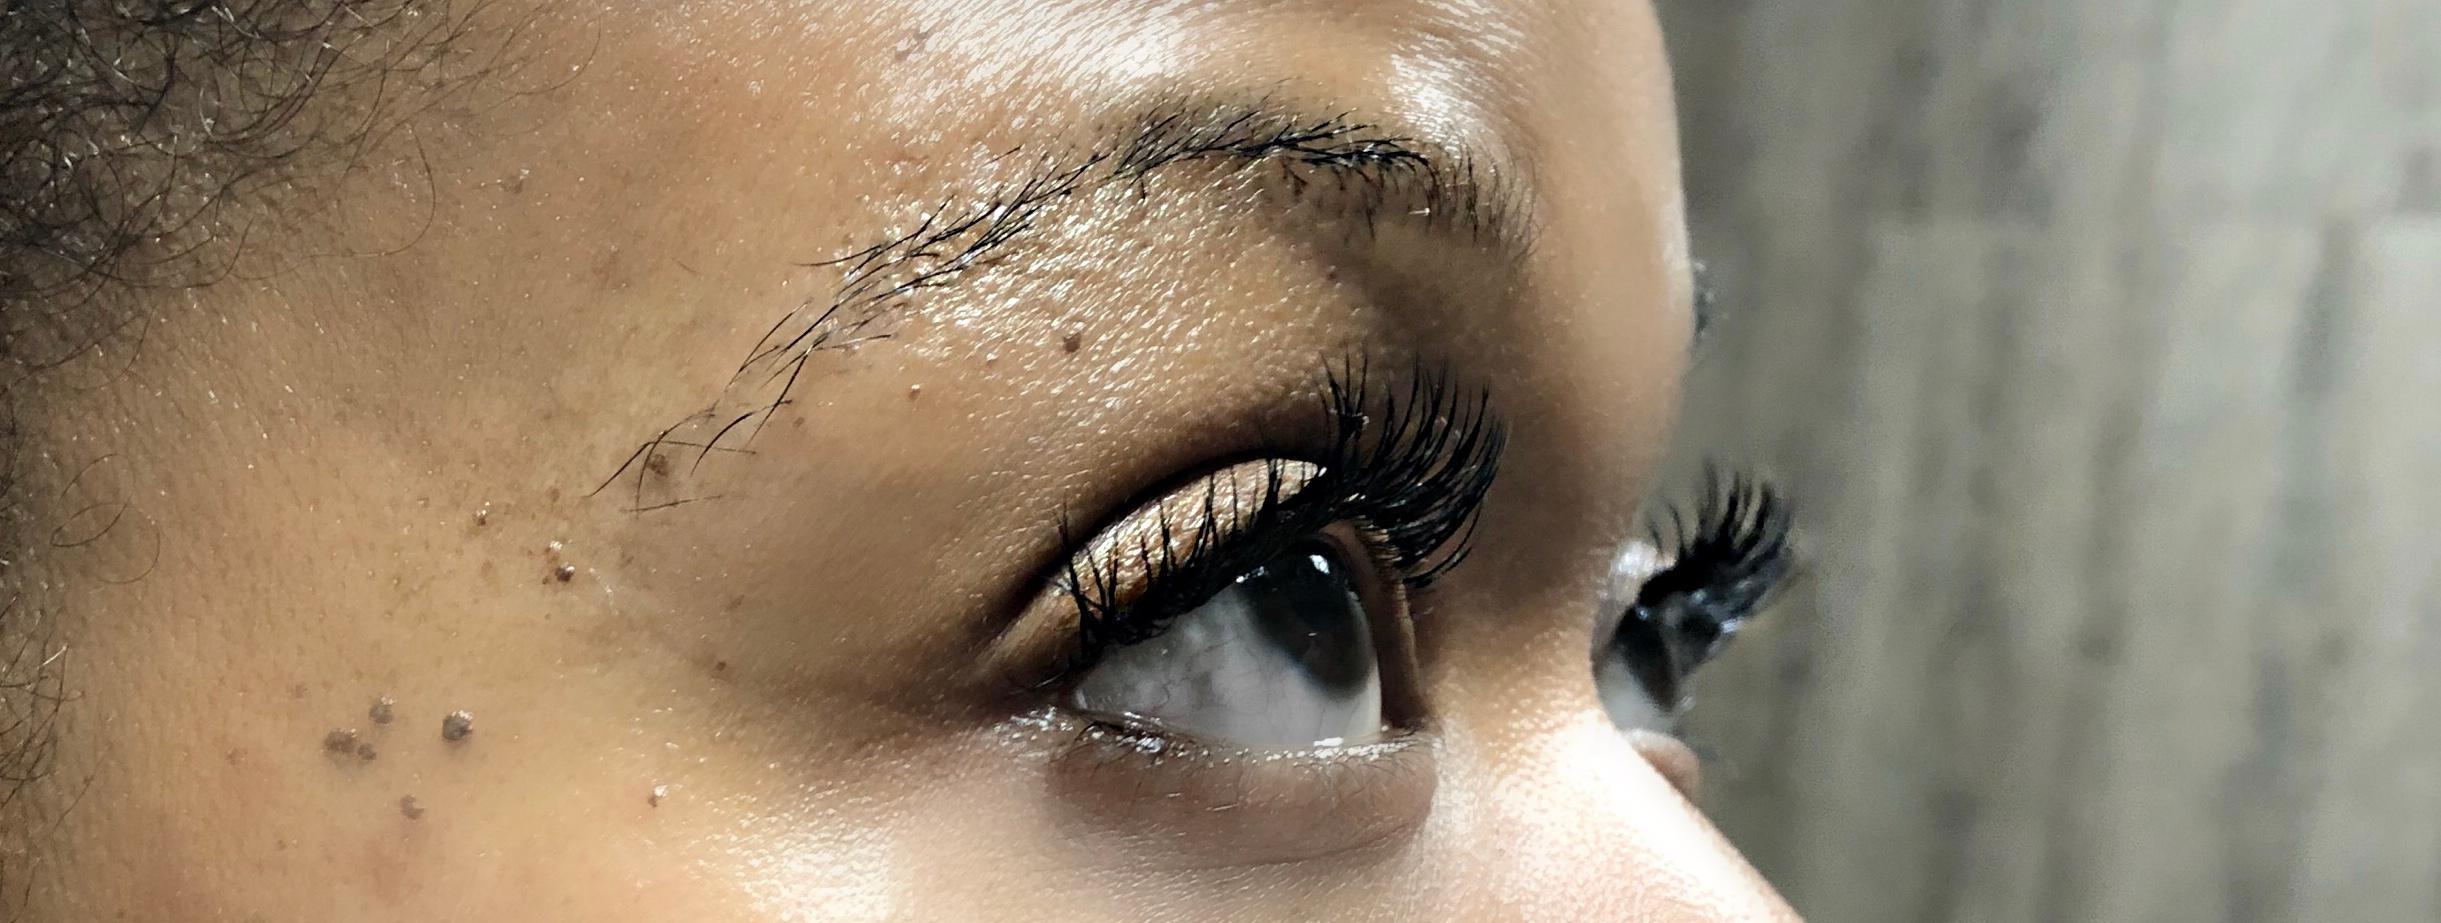 Bodyscapes Salon & Beauty Spa image 20